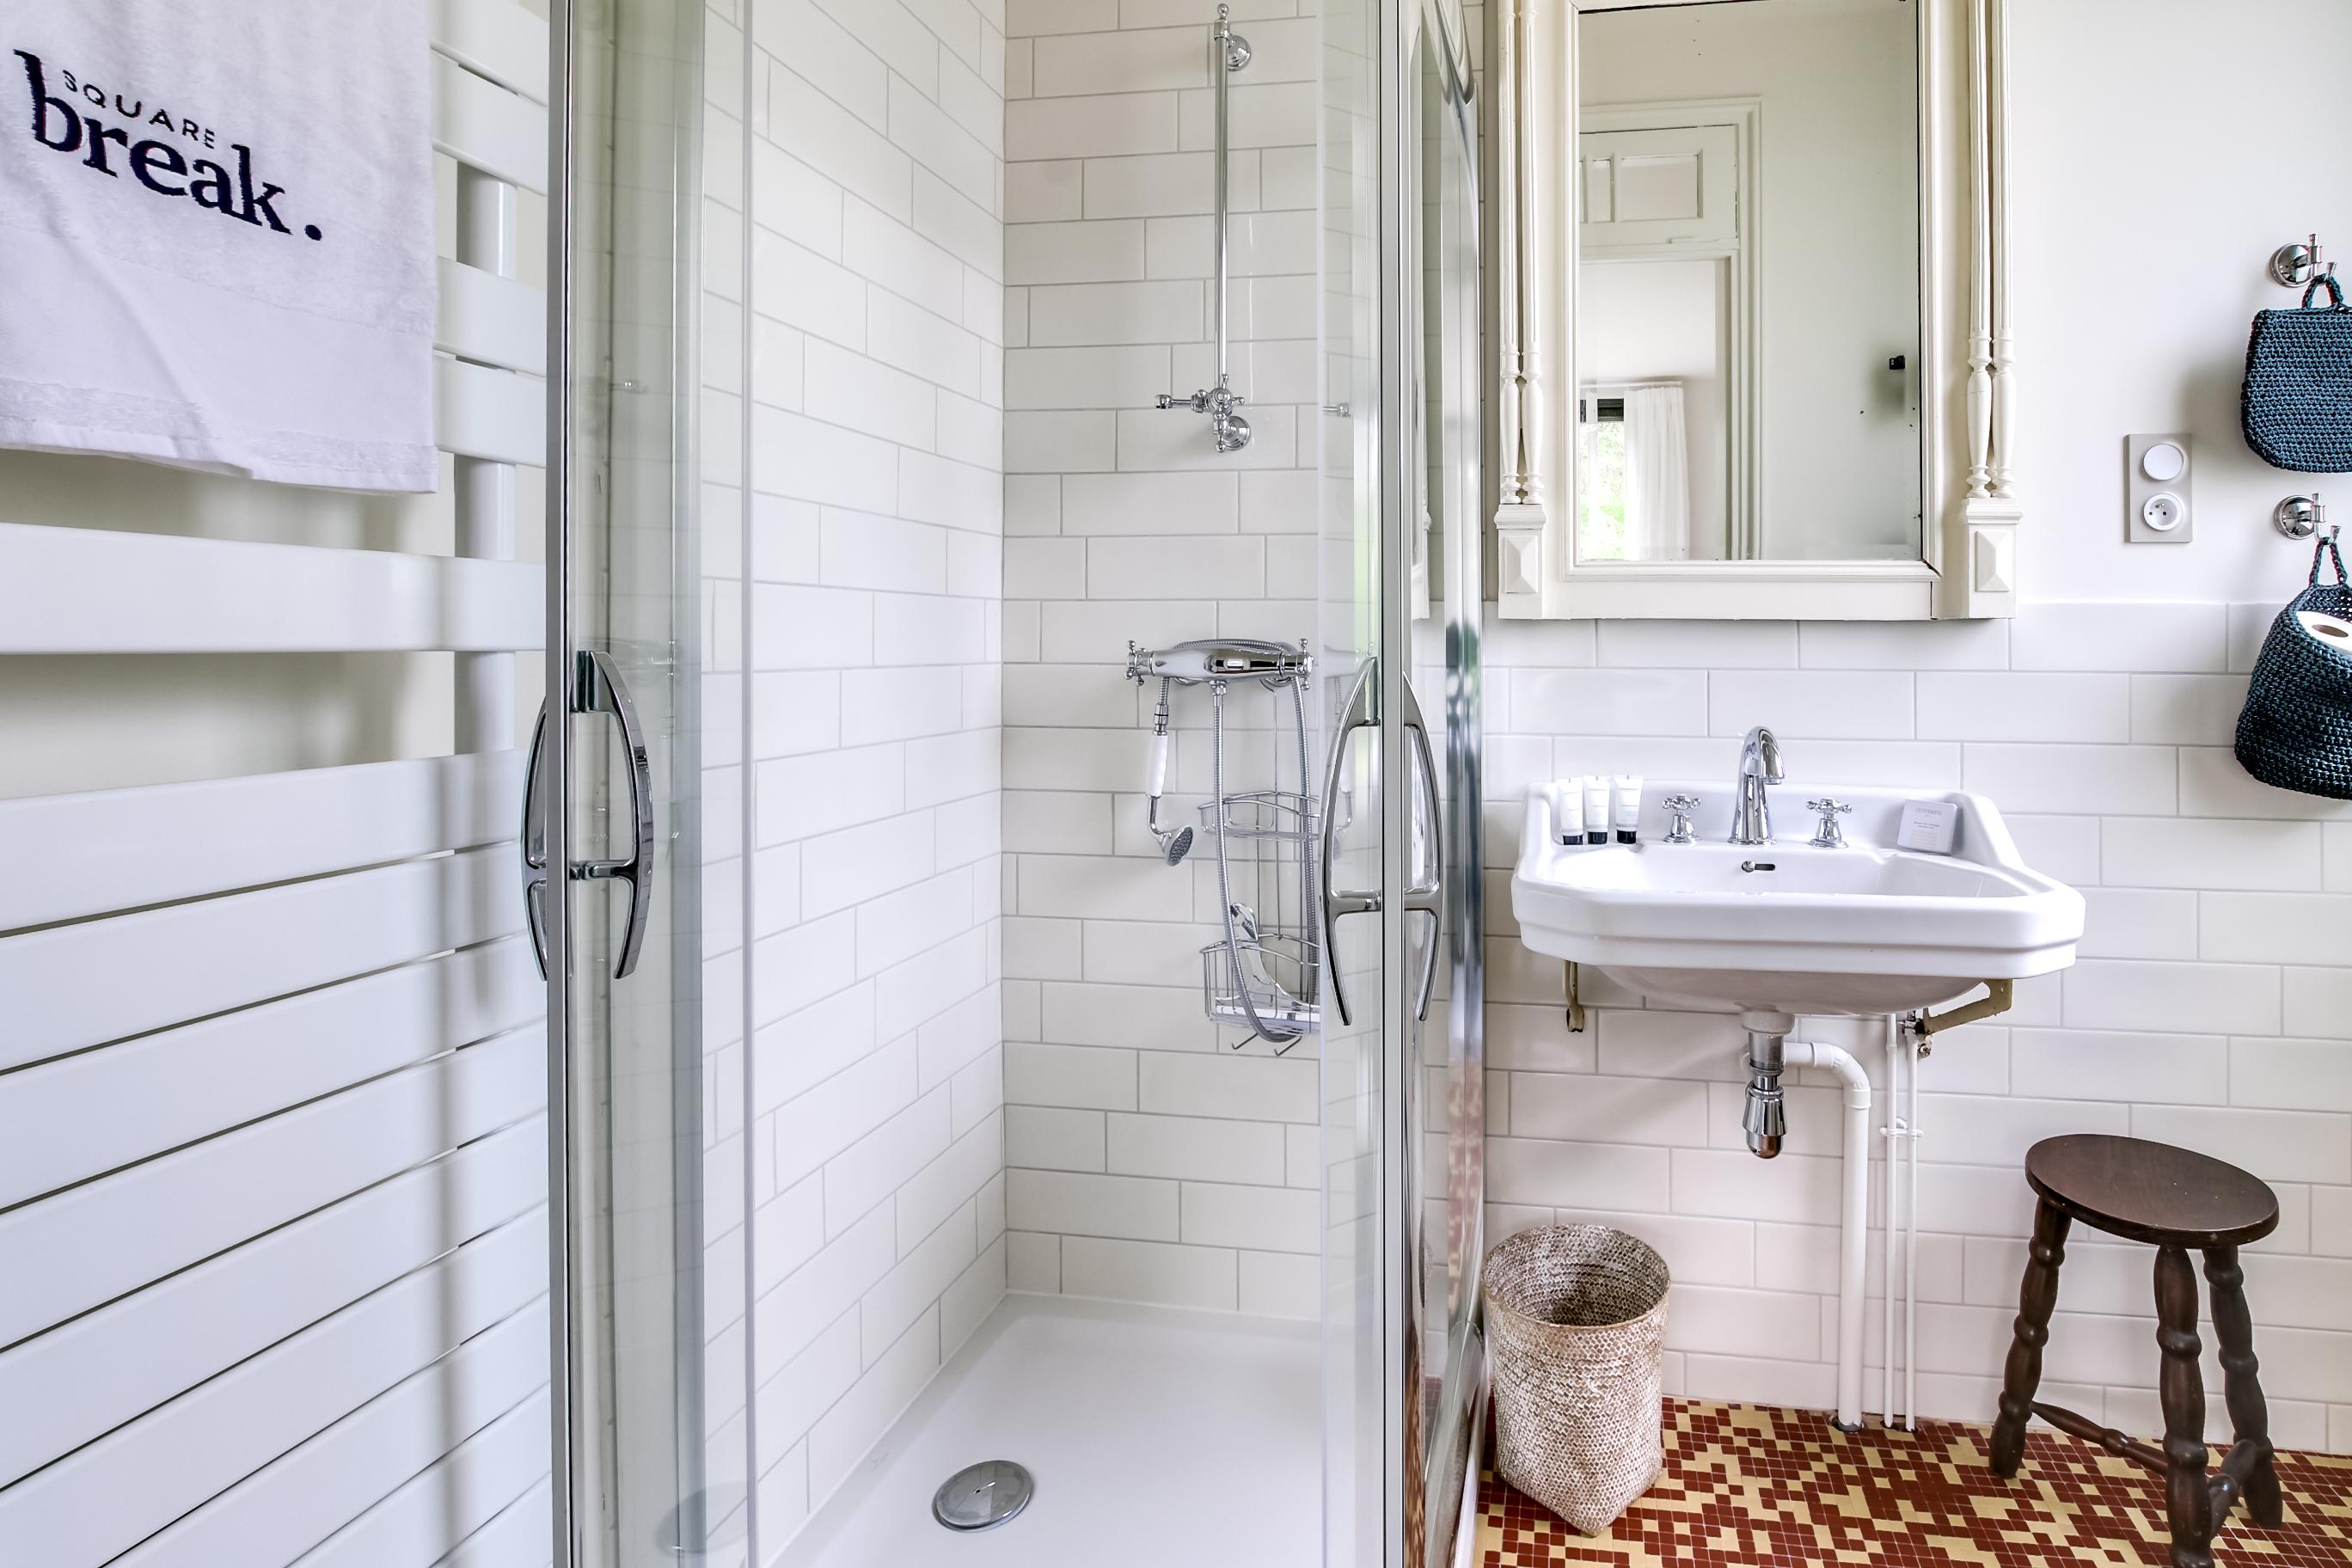 Notre-Dame | Luxury Rental in Trouville-sur-Mer | onefinestay